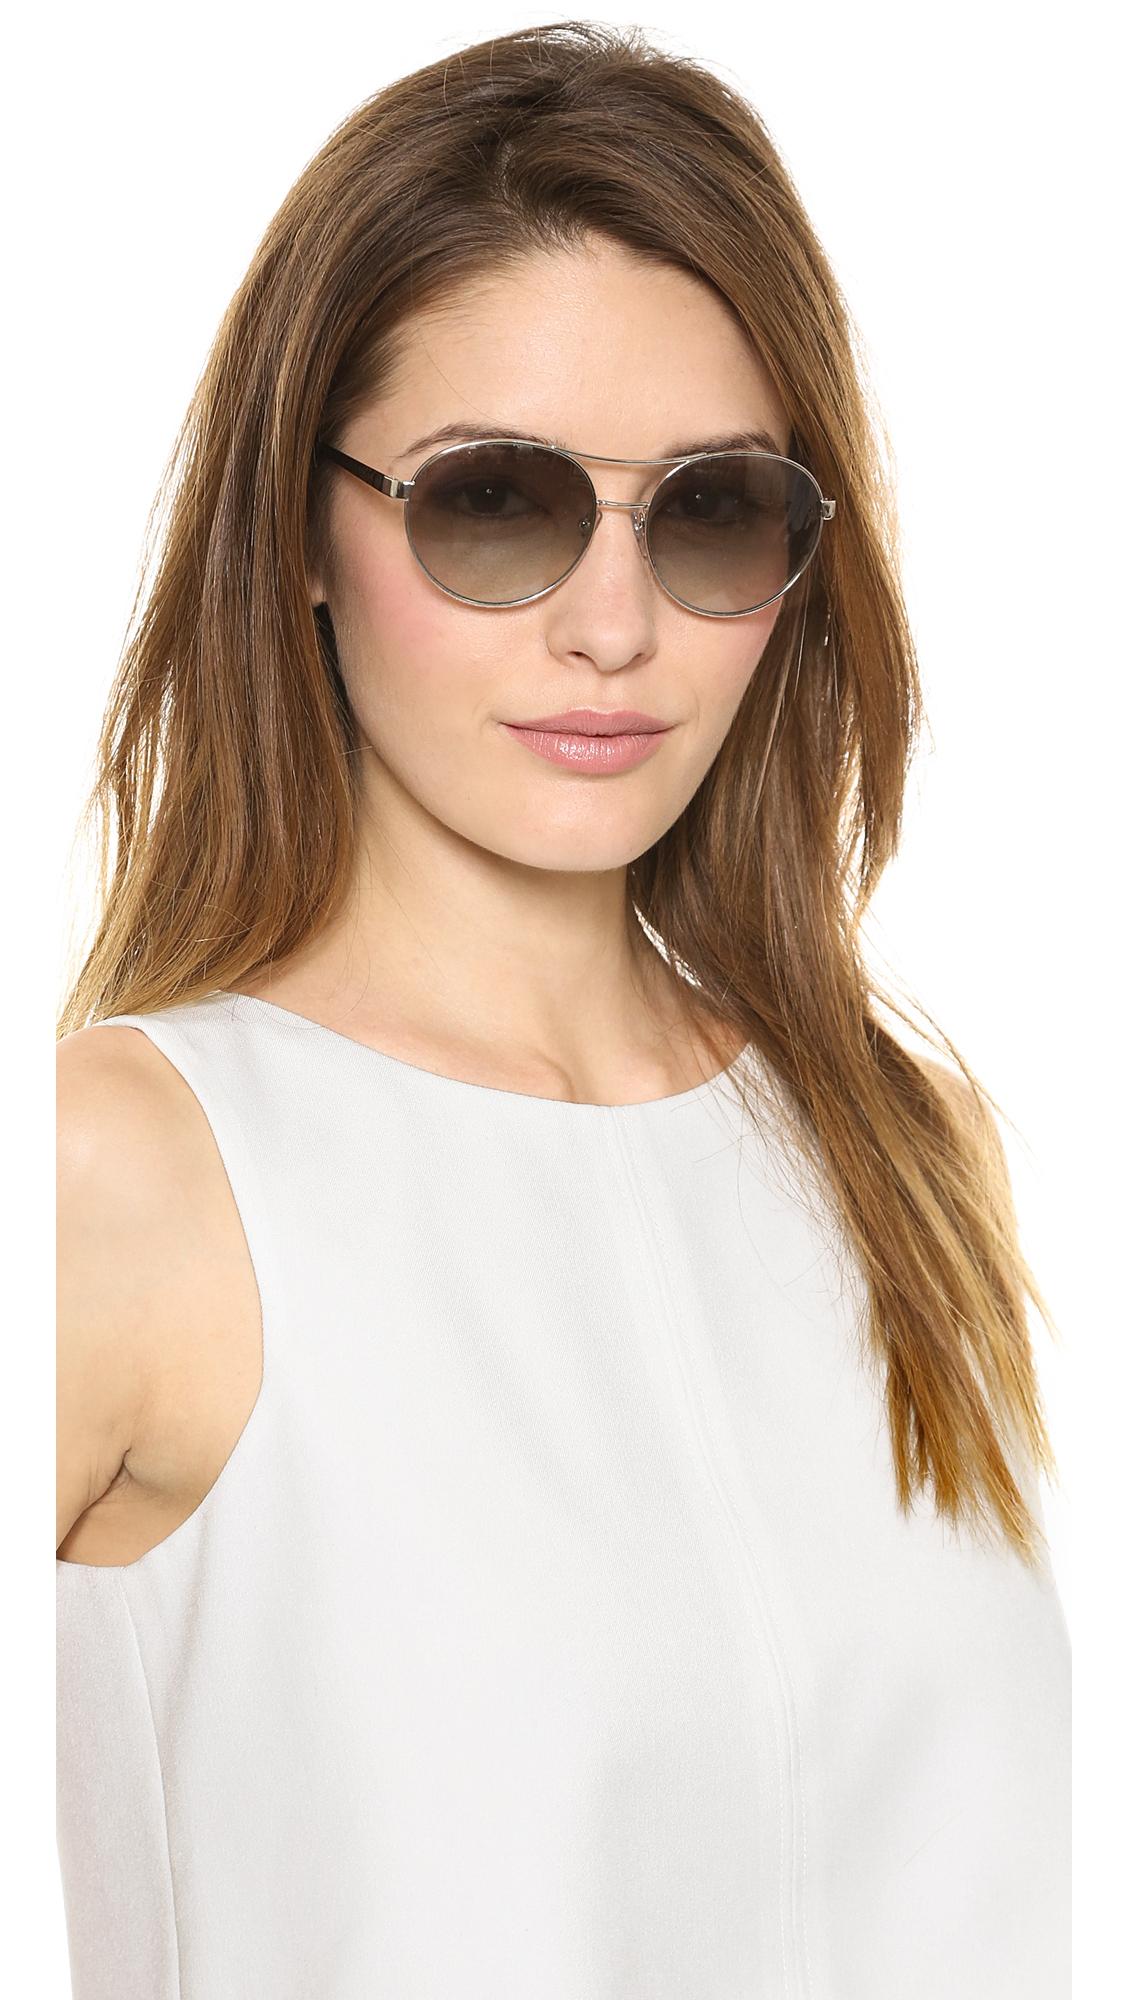 88f6939170 Lyst - Tory Burch Gradient Aviator Sunglasses - Silver Black Grey ...